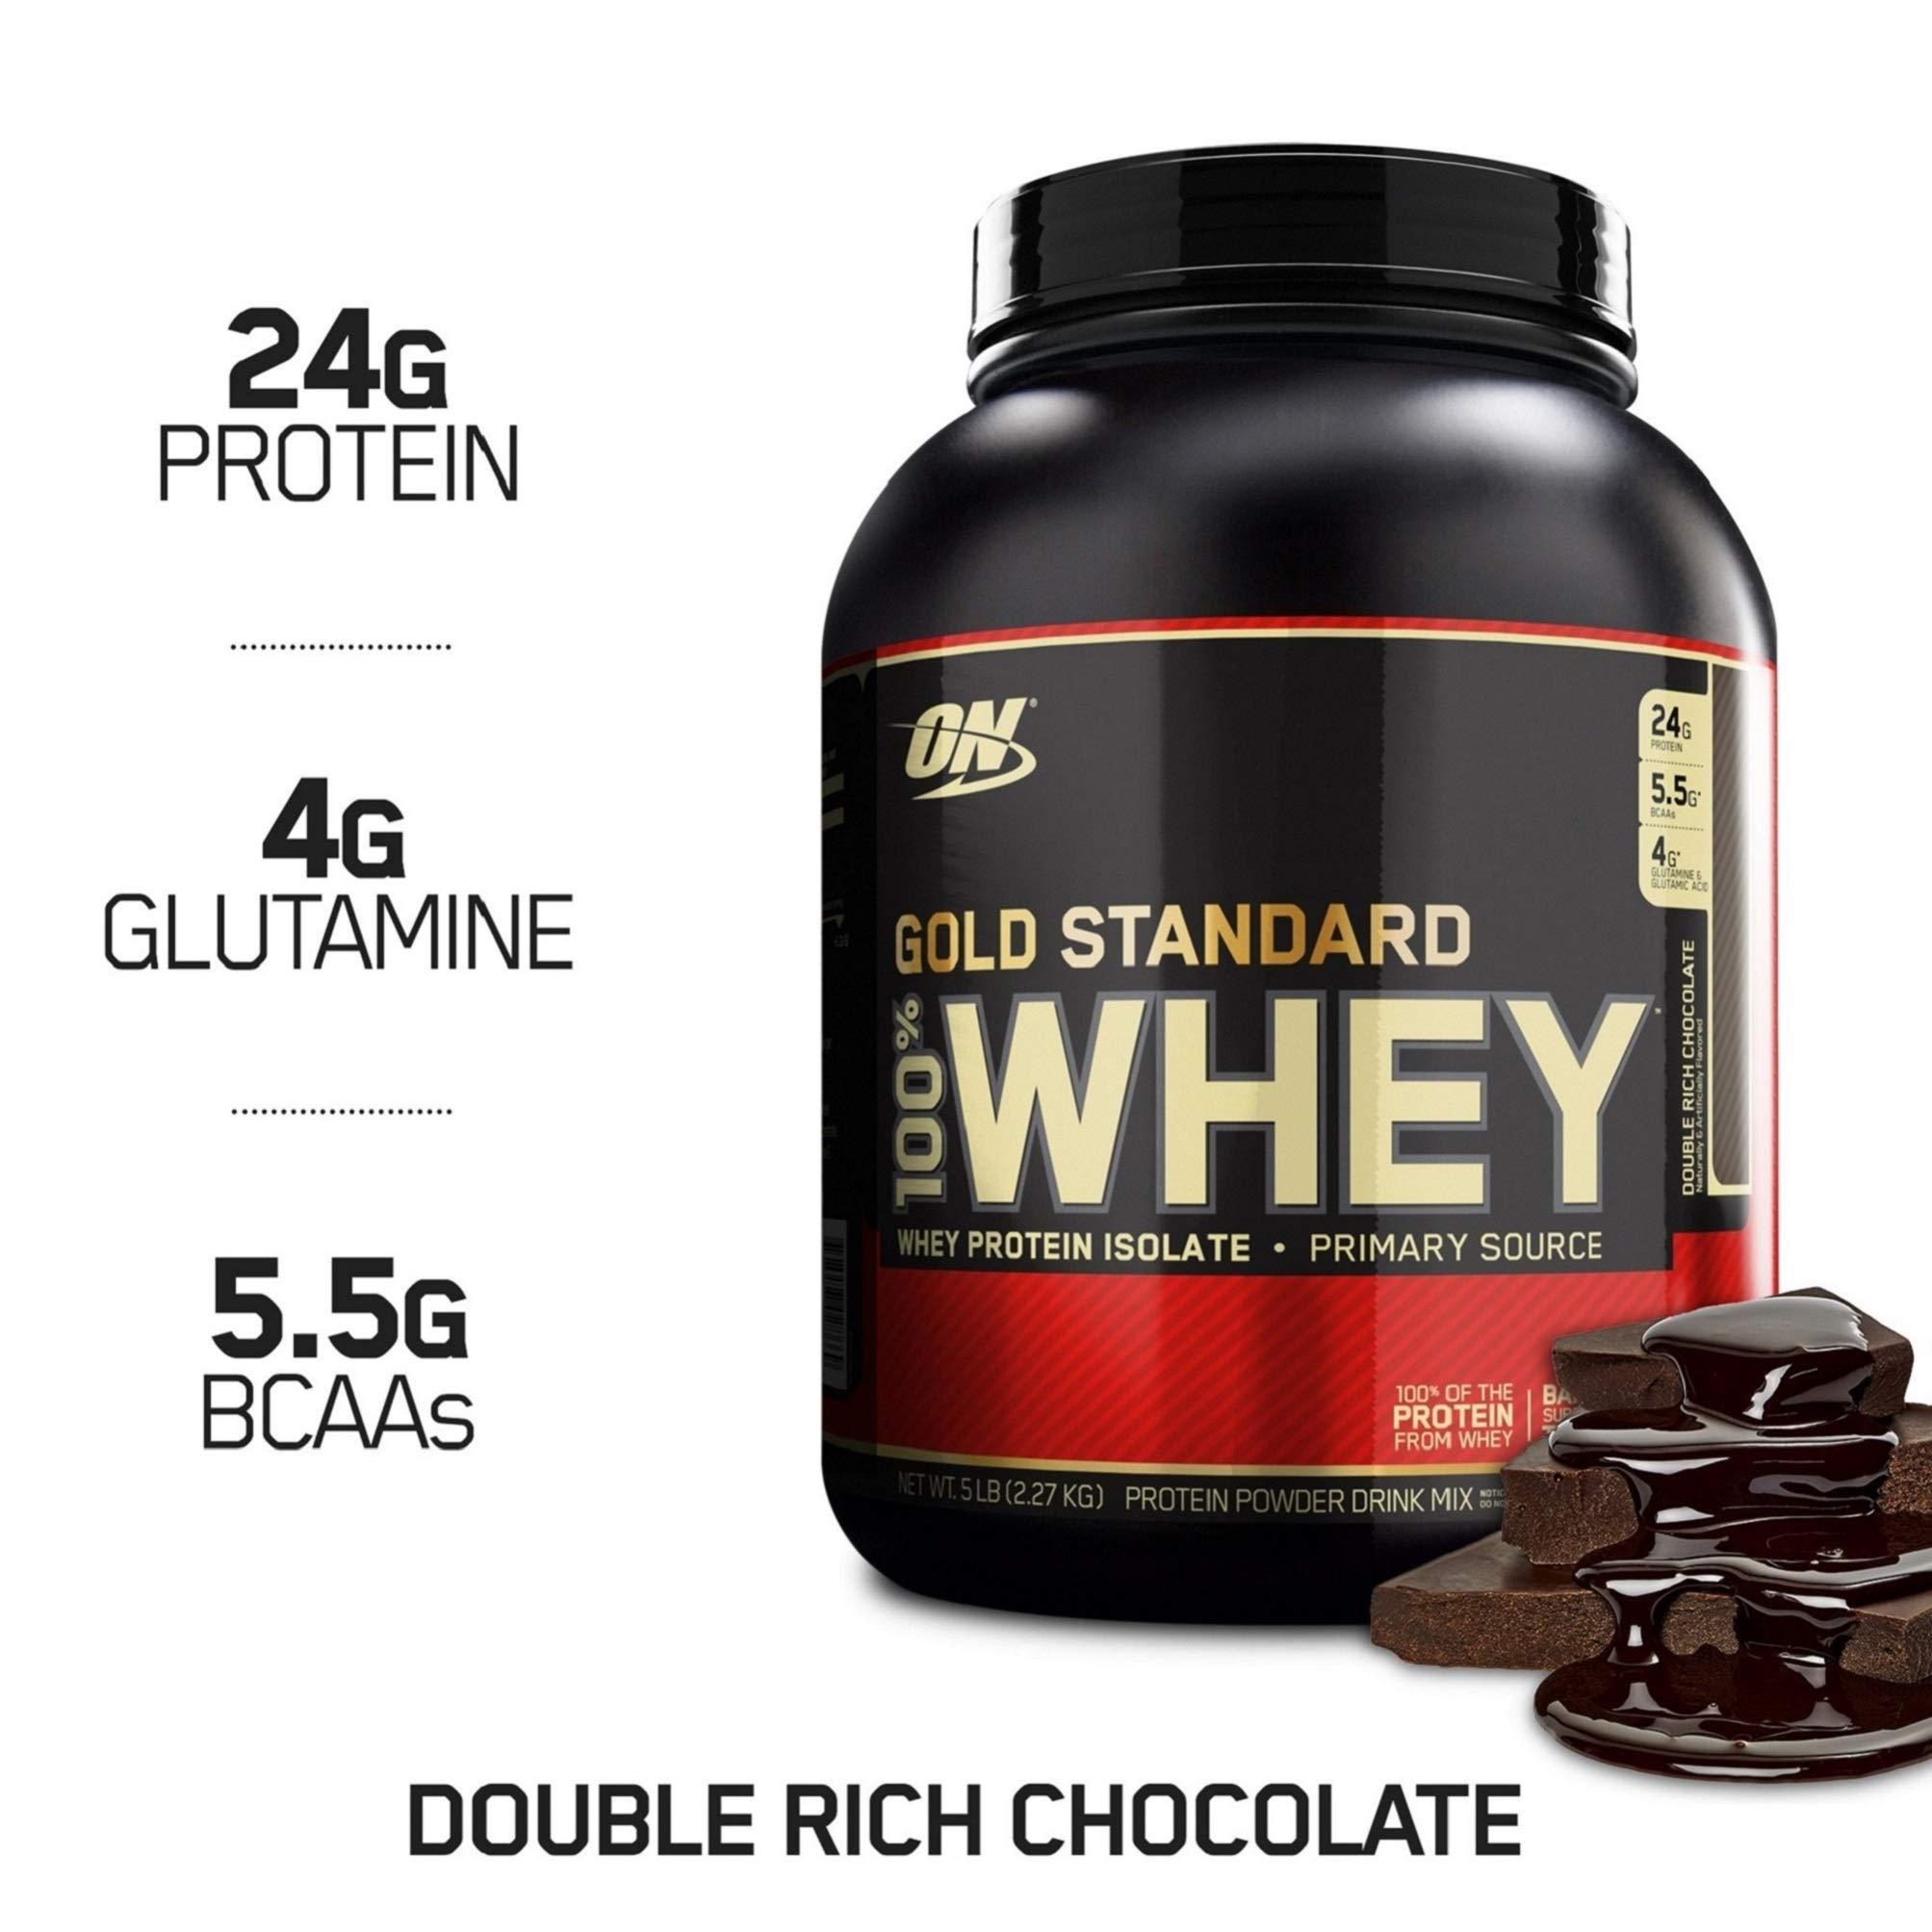 Optimum Nutrition Gold Standard 100% Whey Protein Powder, Double Rich Chocolate, 5 Pound by Optimum Nutrition